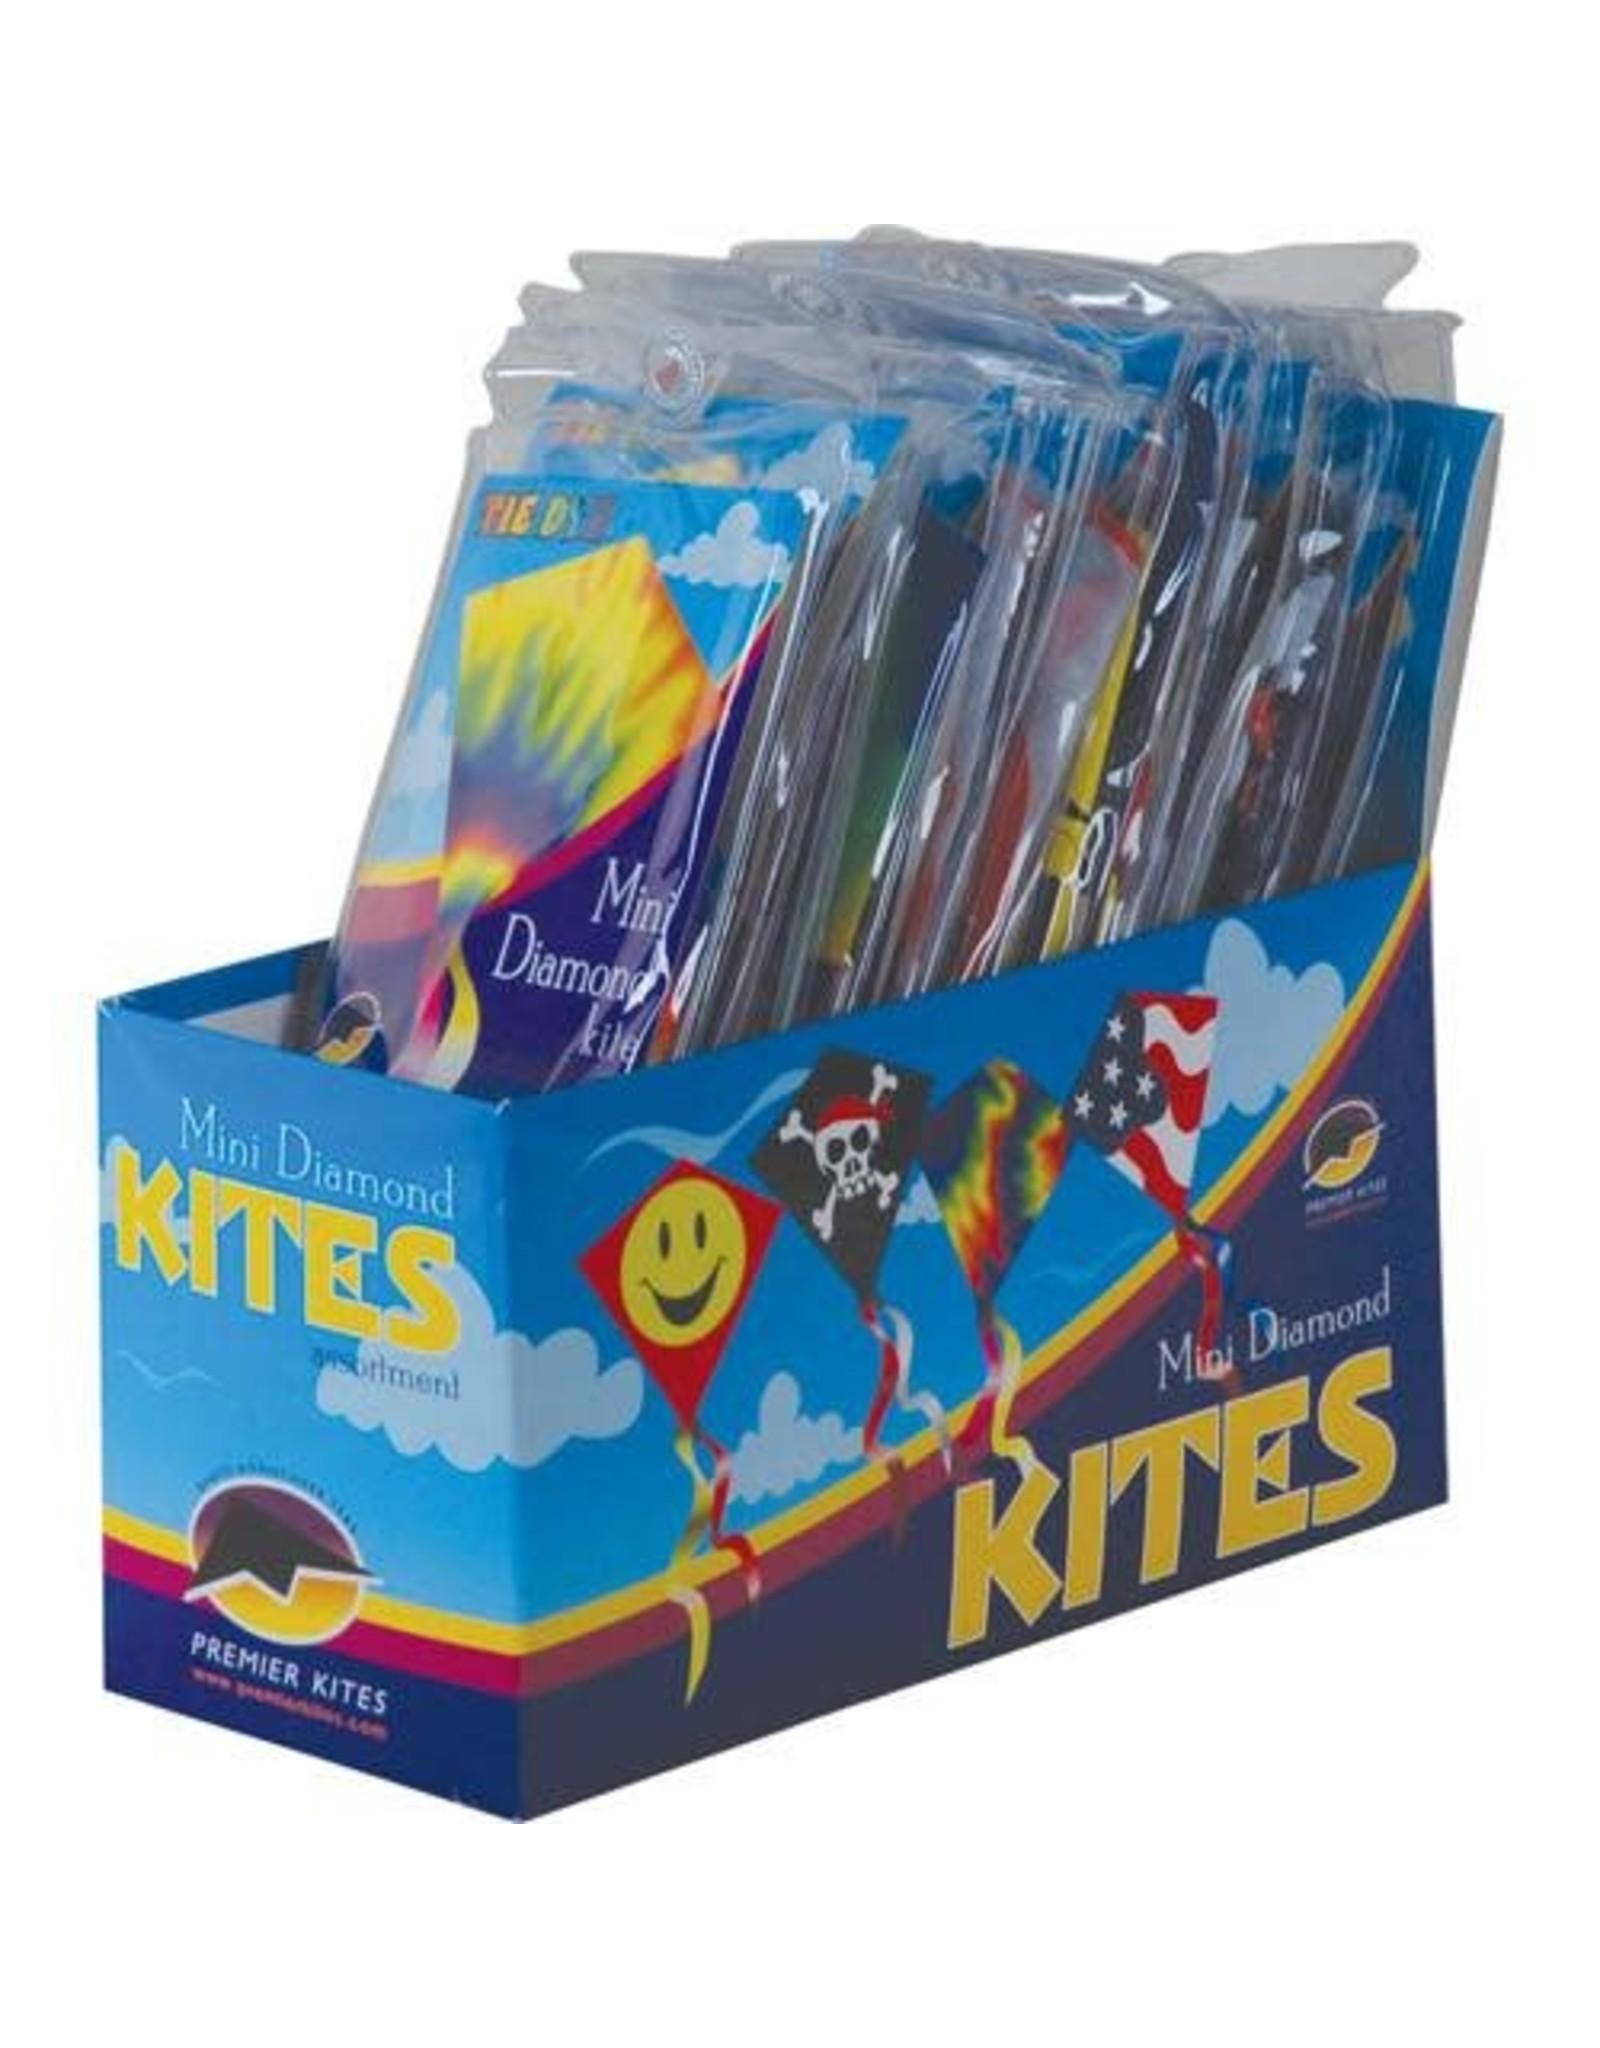 Premier Kites Mini Diamond Kite Assortment